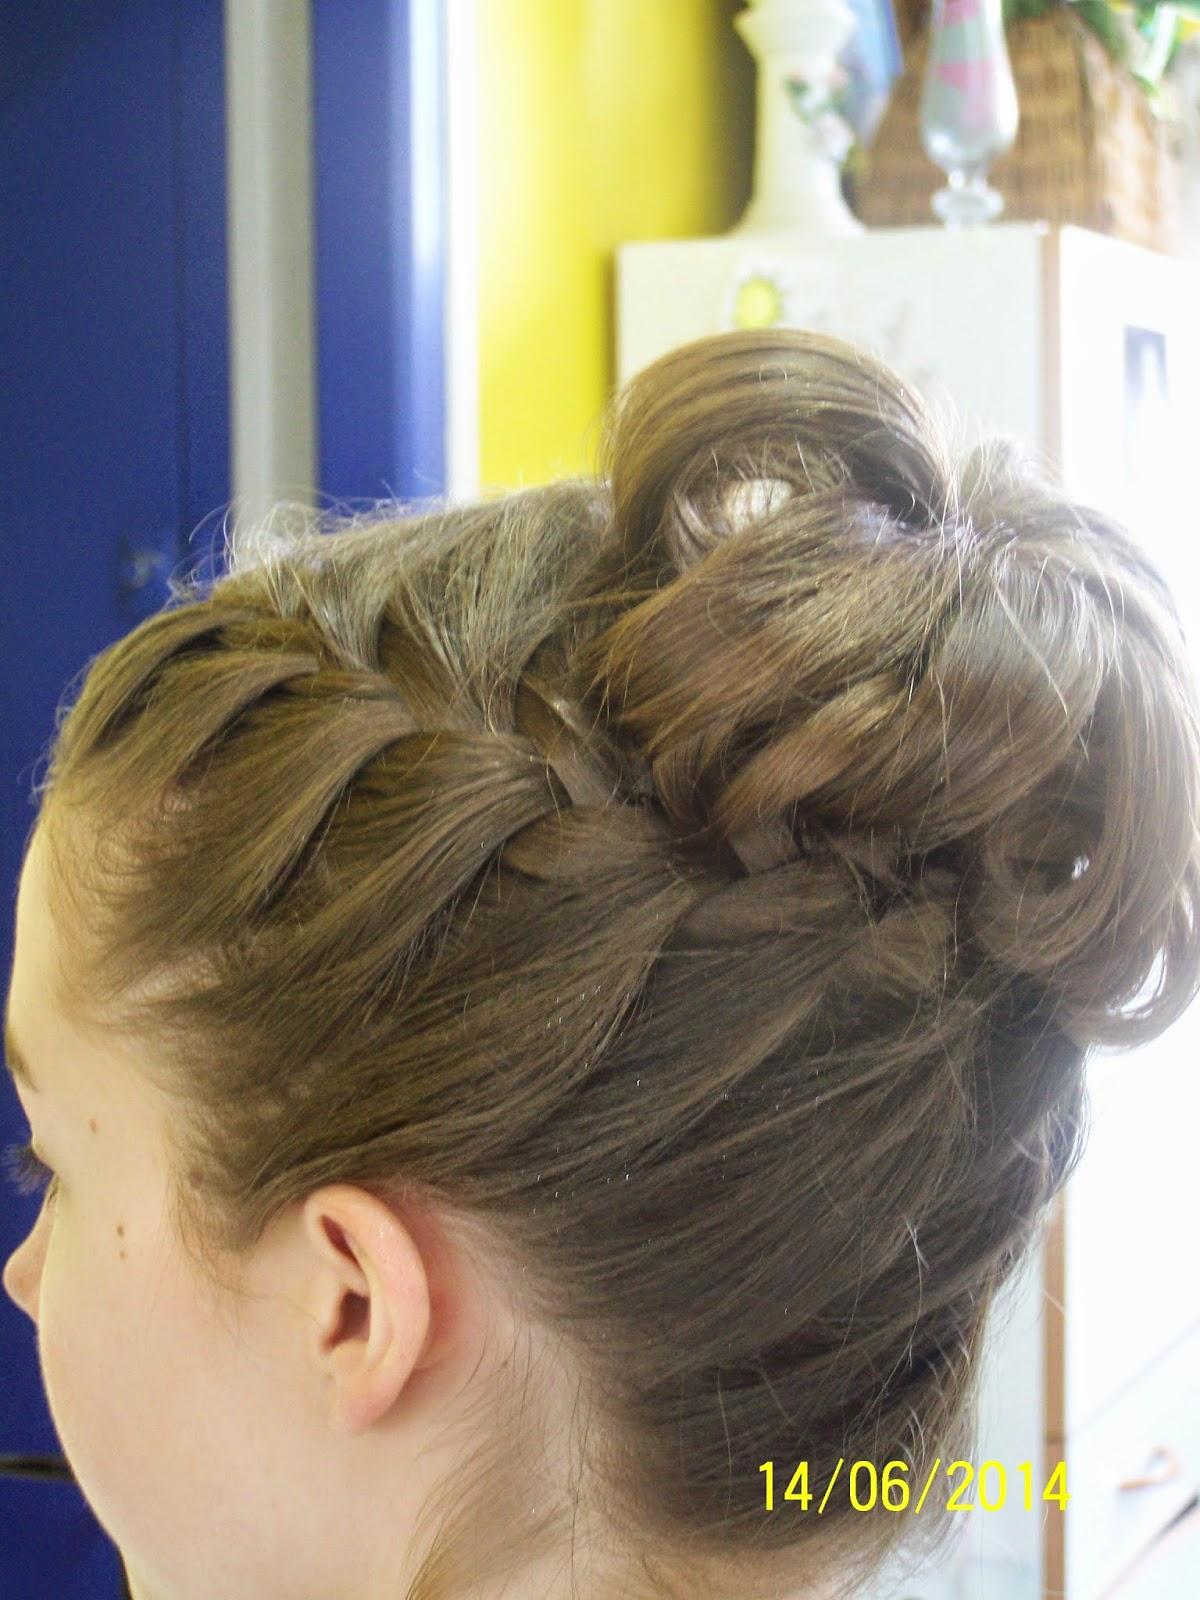 Benedicte coiffure mixte coiffure de c r monie sur for Salon de coiffure qui recherche apprenti